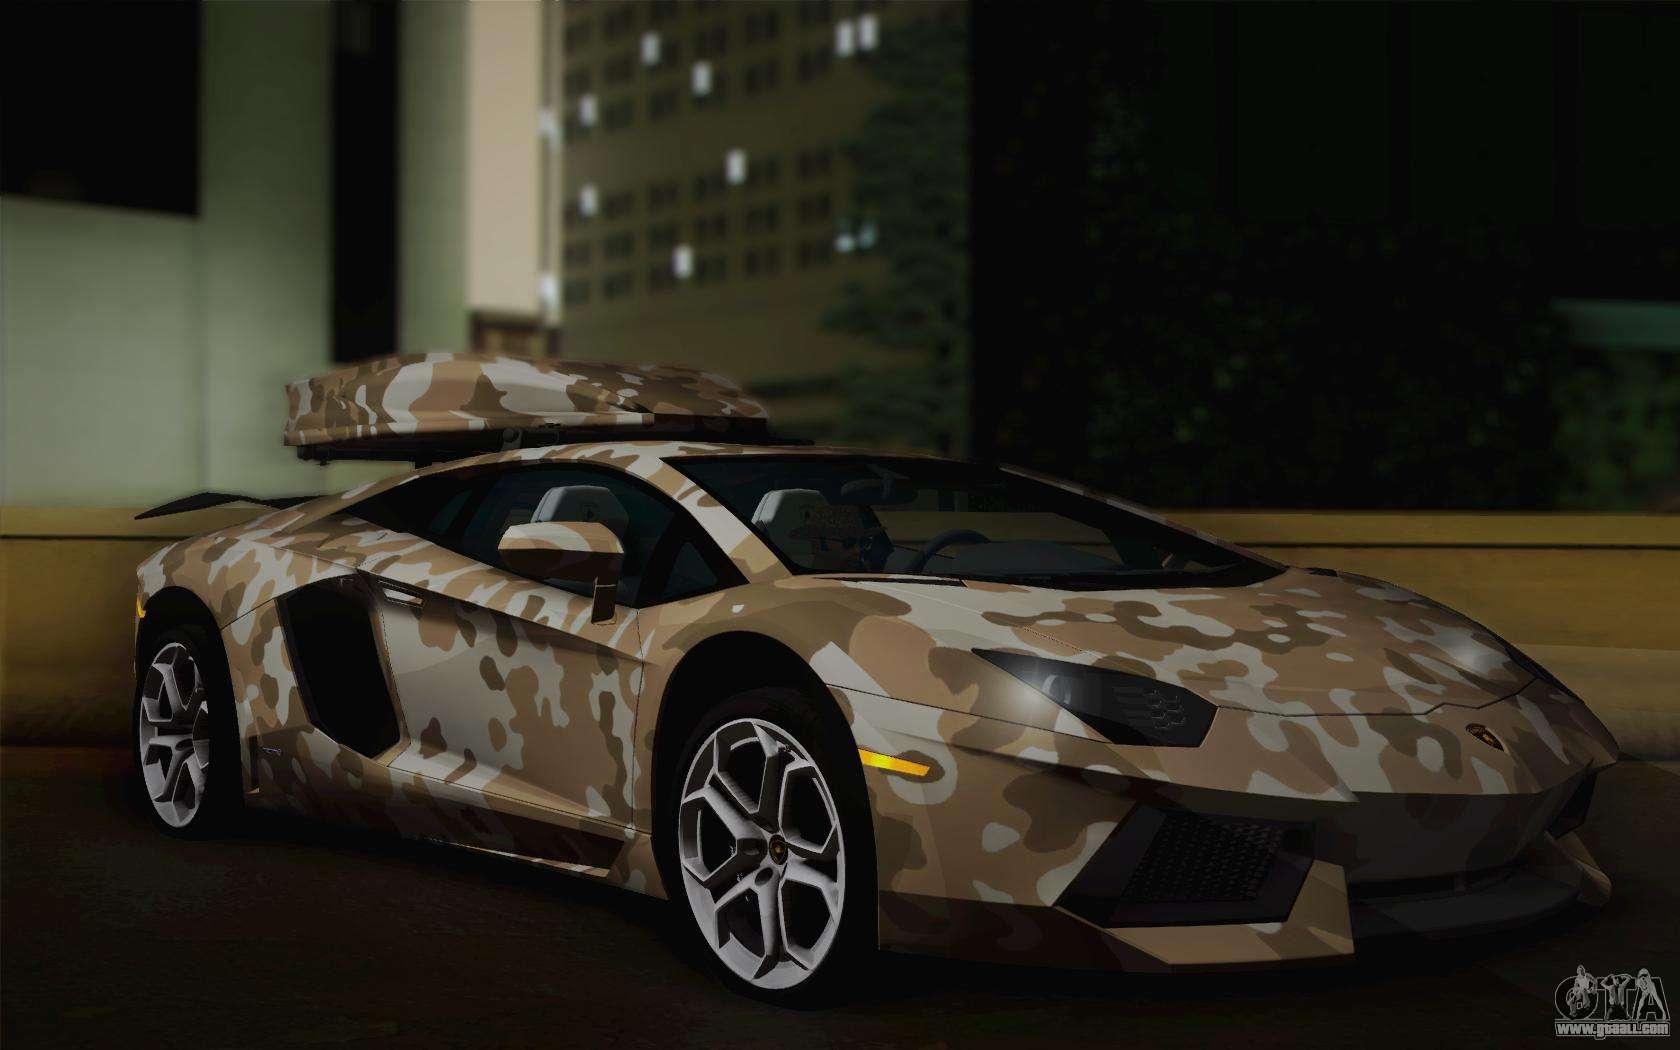 Cheetah Wallpaper Hd Lamborghini Aventador Lp 700 4 Camouflage For Gta San Andreas